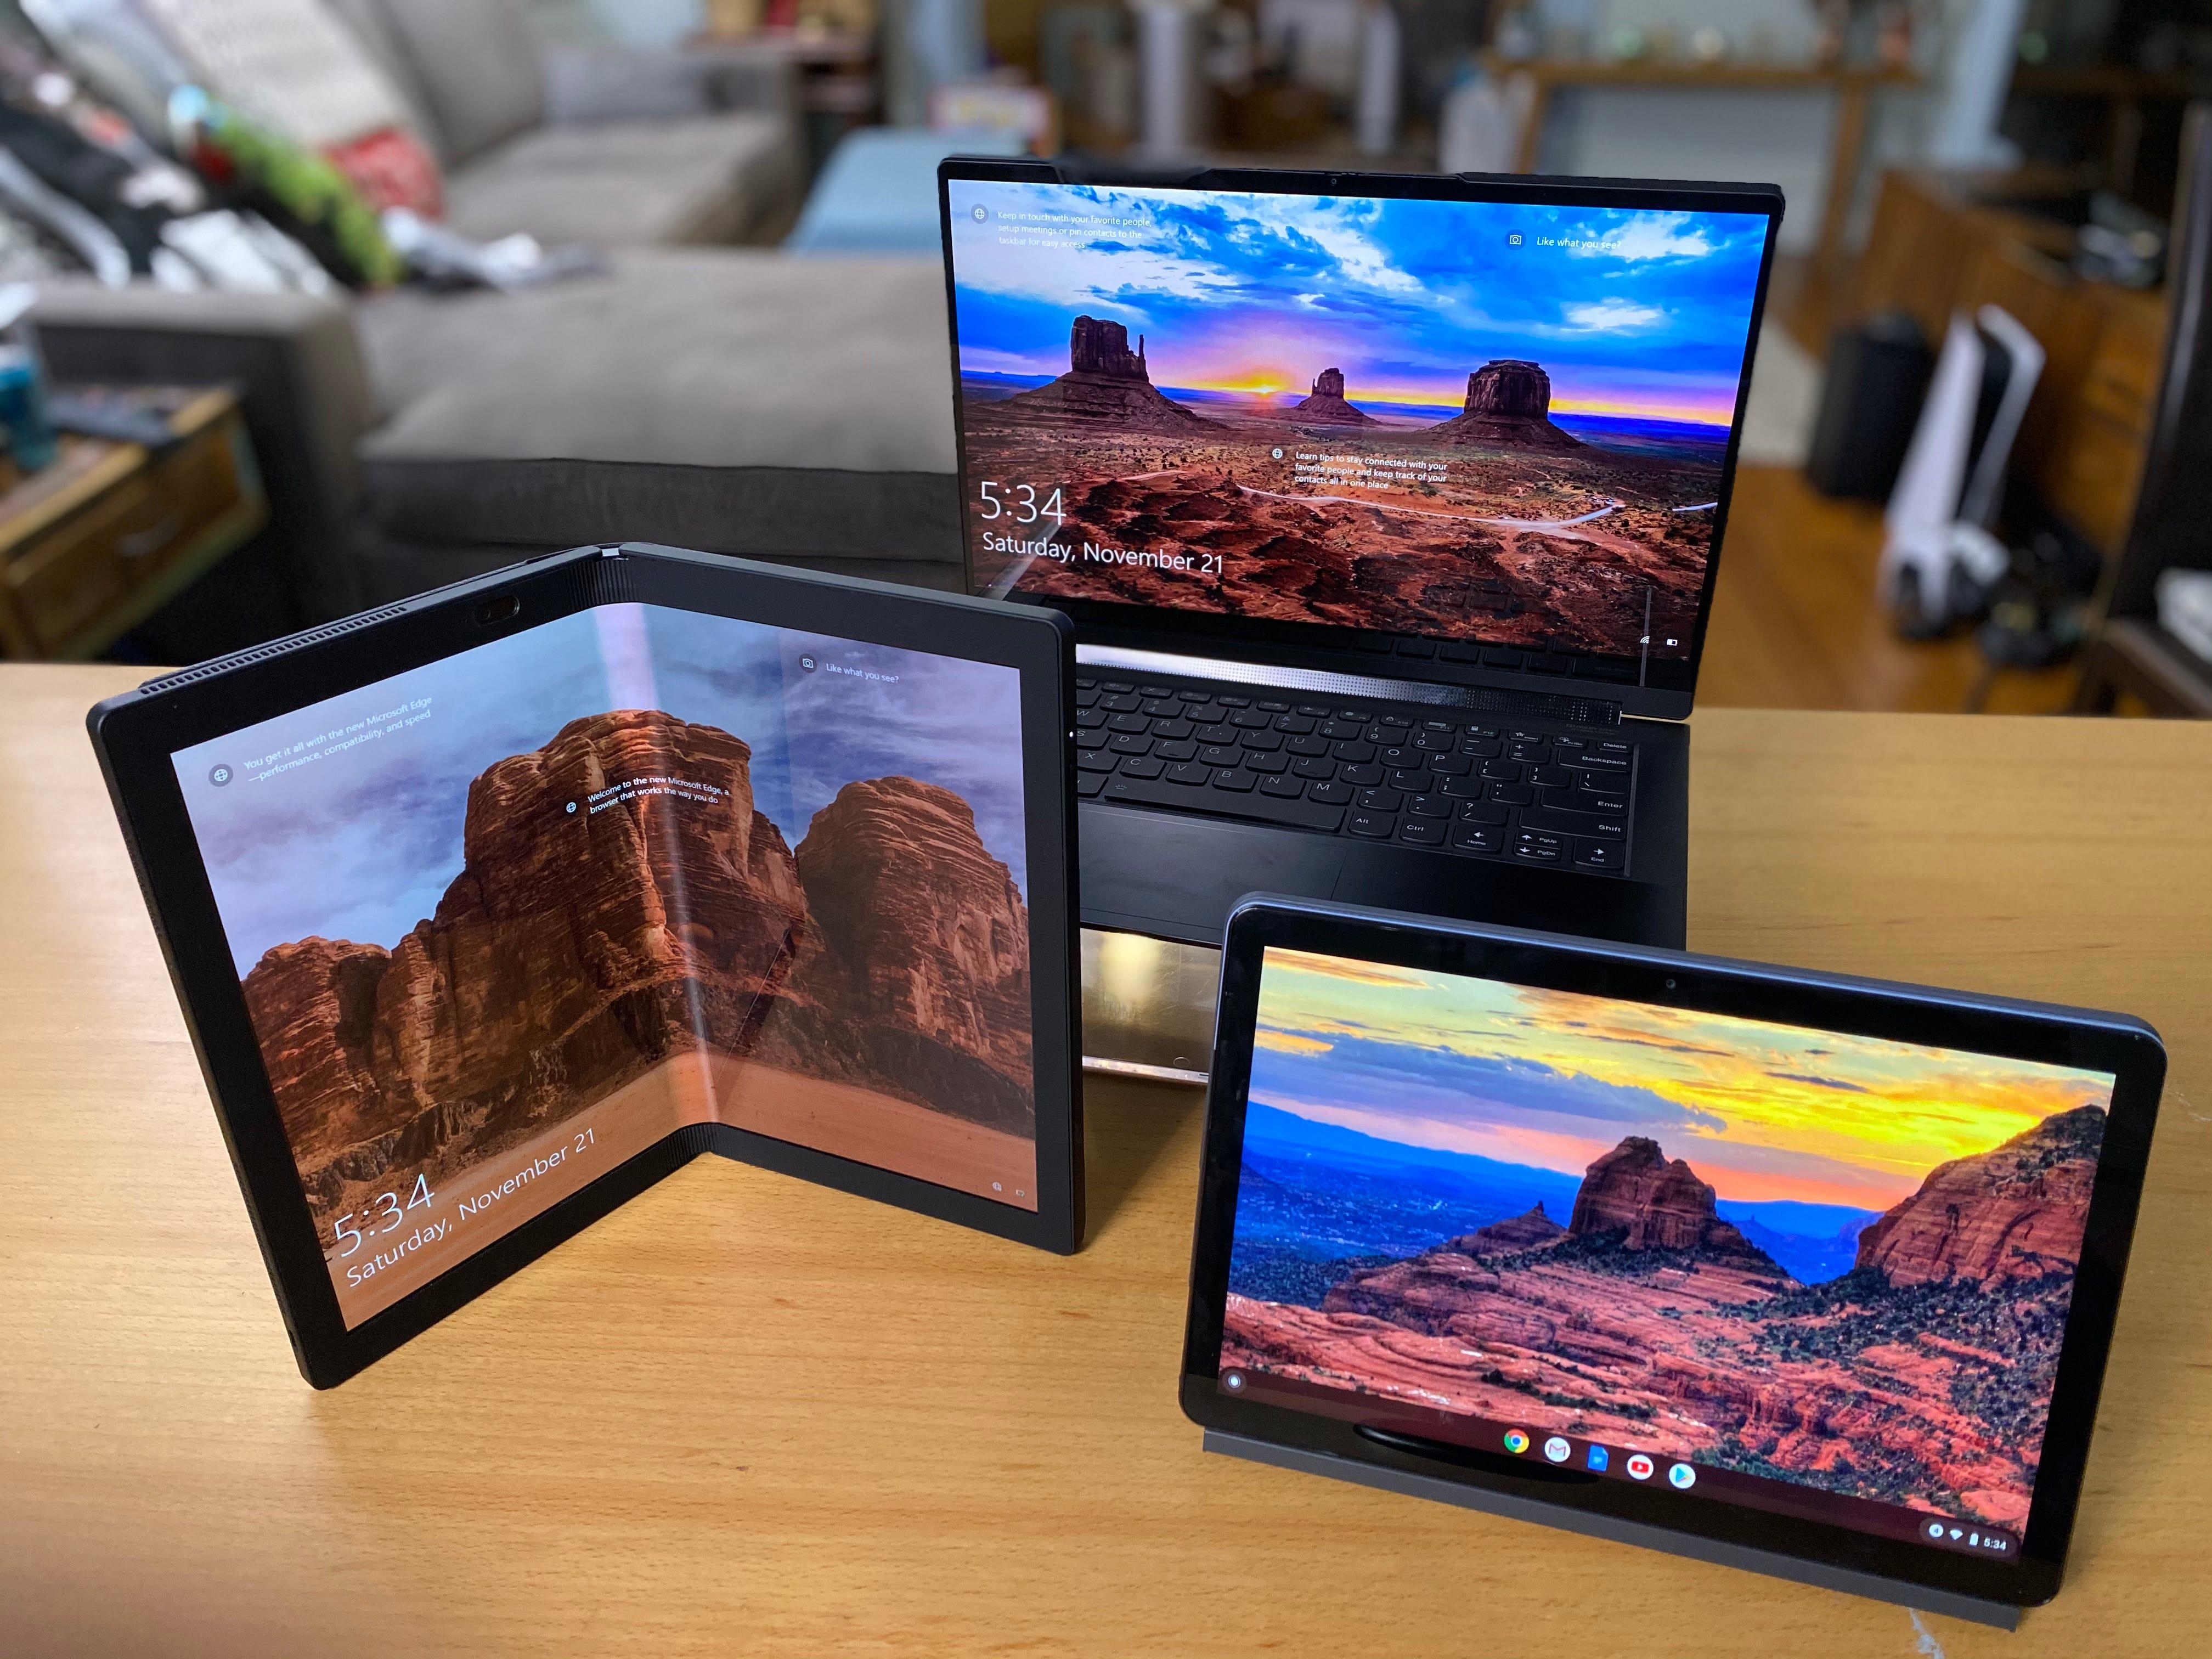 Laptops Nintendo Switch Stem The Hot Consumer Tech For 2020